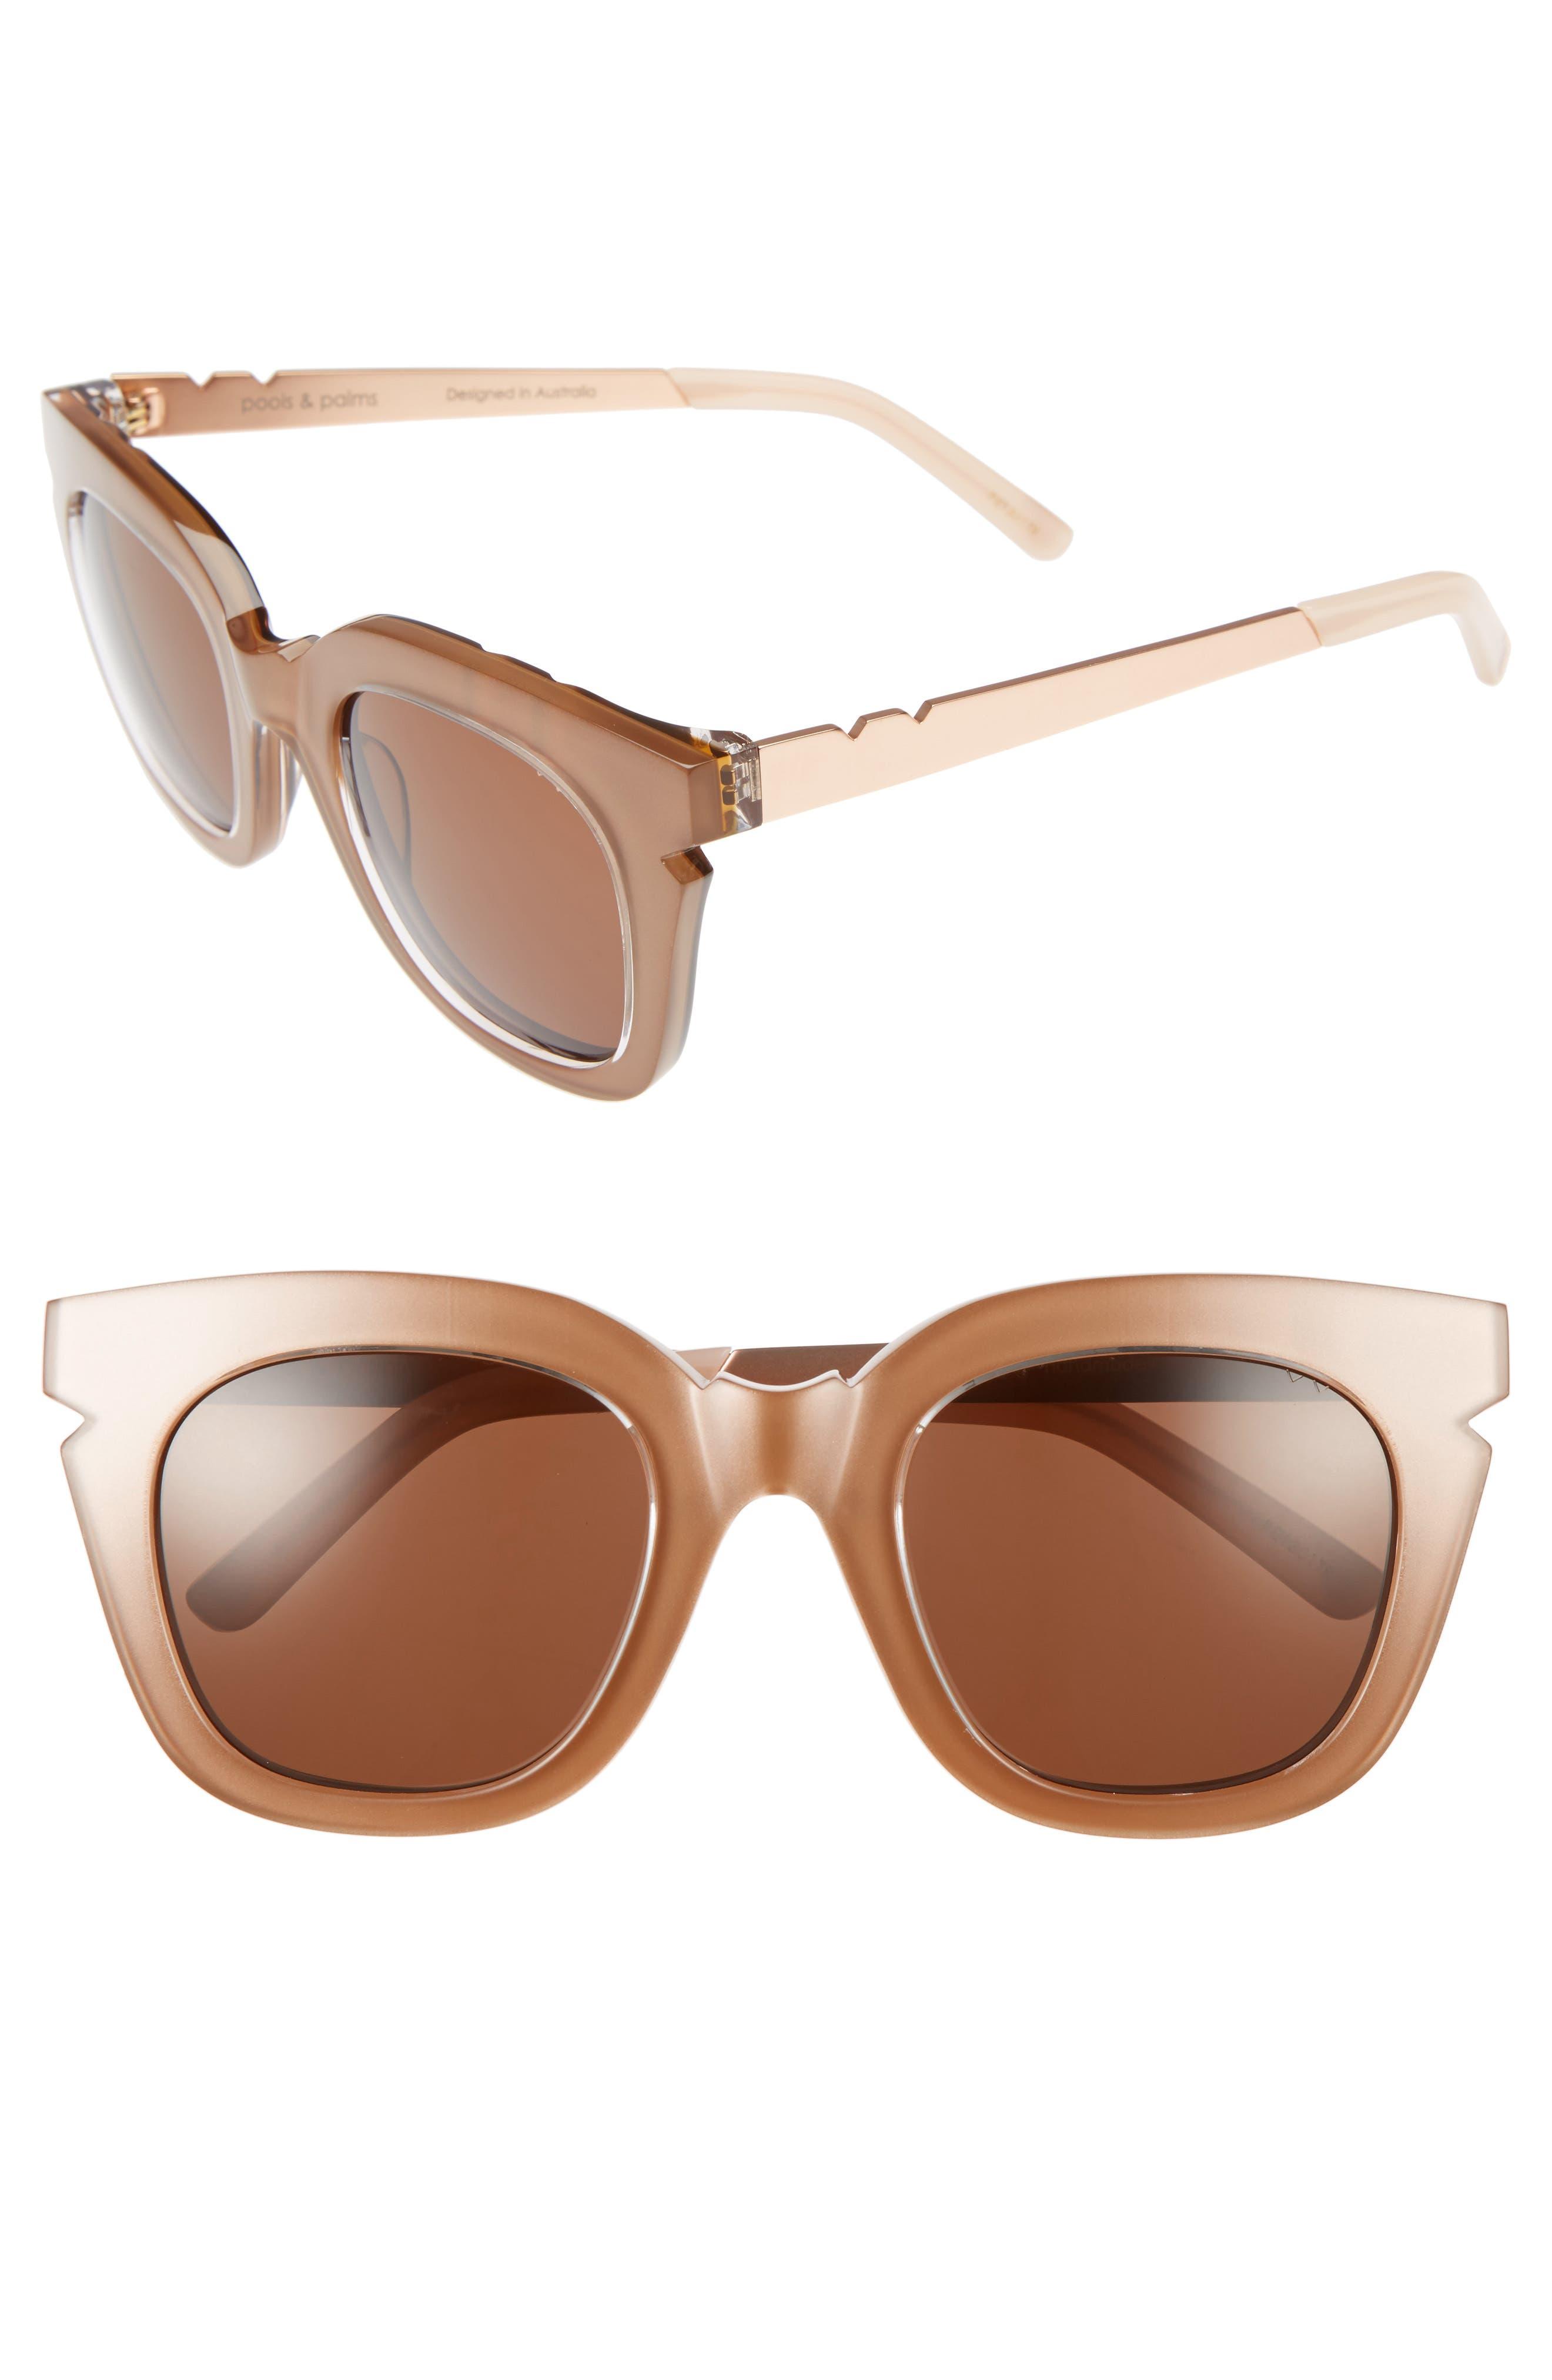 Pared Pools & Palms 50mm Sunglasses